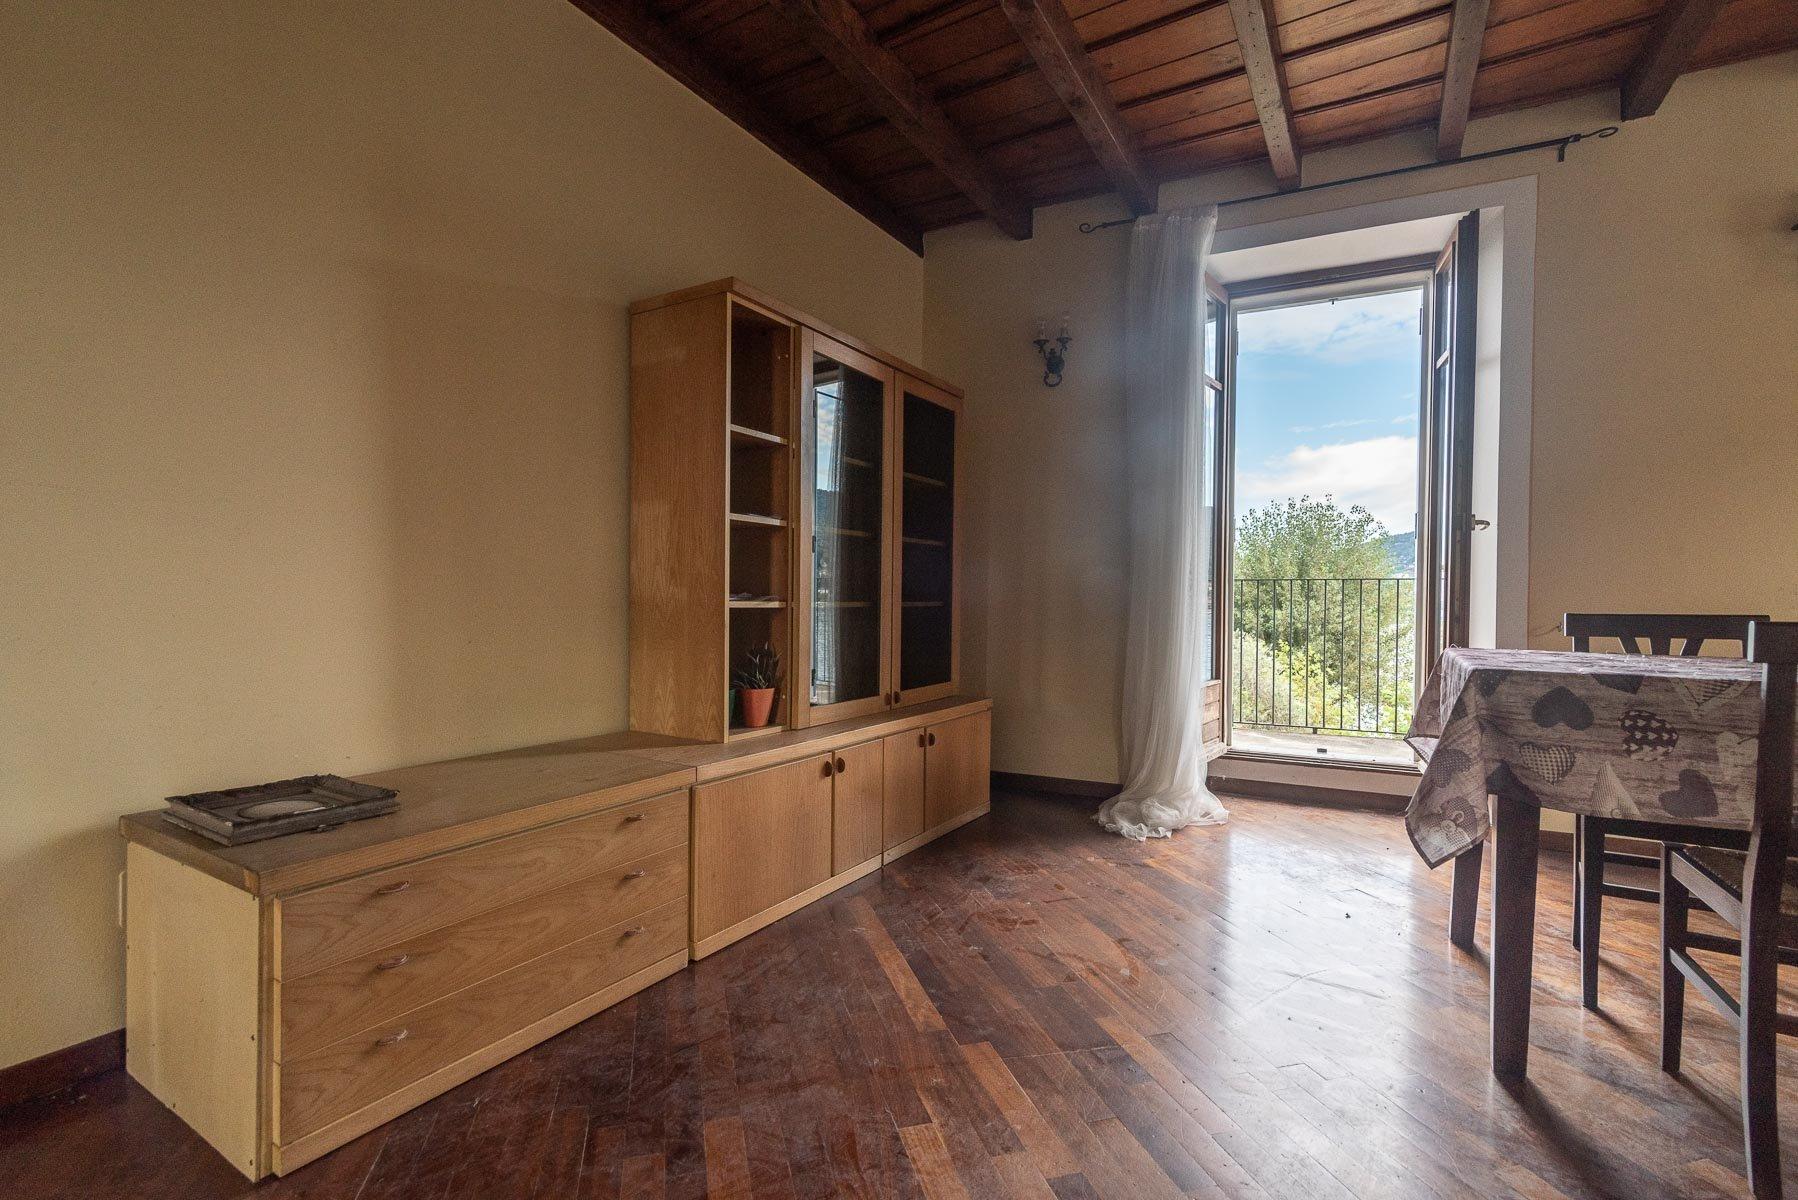 Apartment for sale in Pescatori island,Stresa-living room